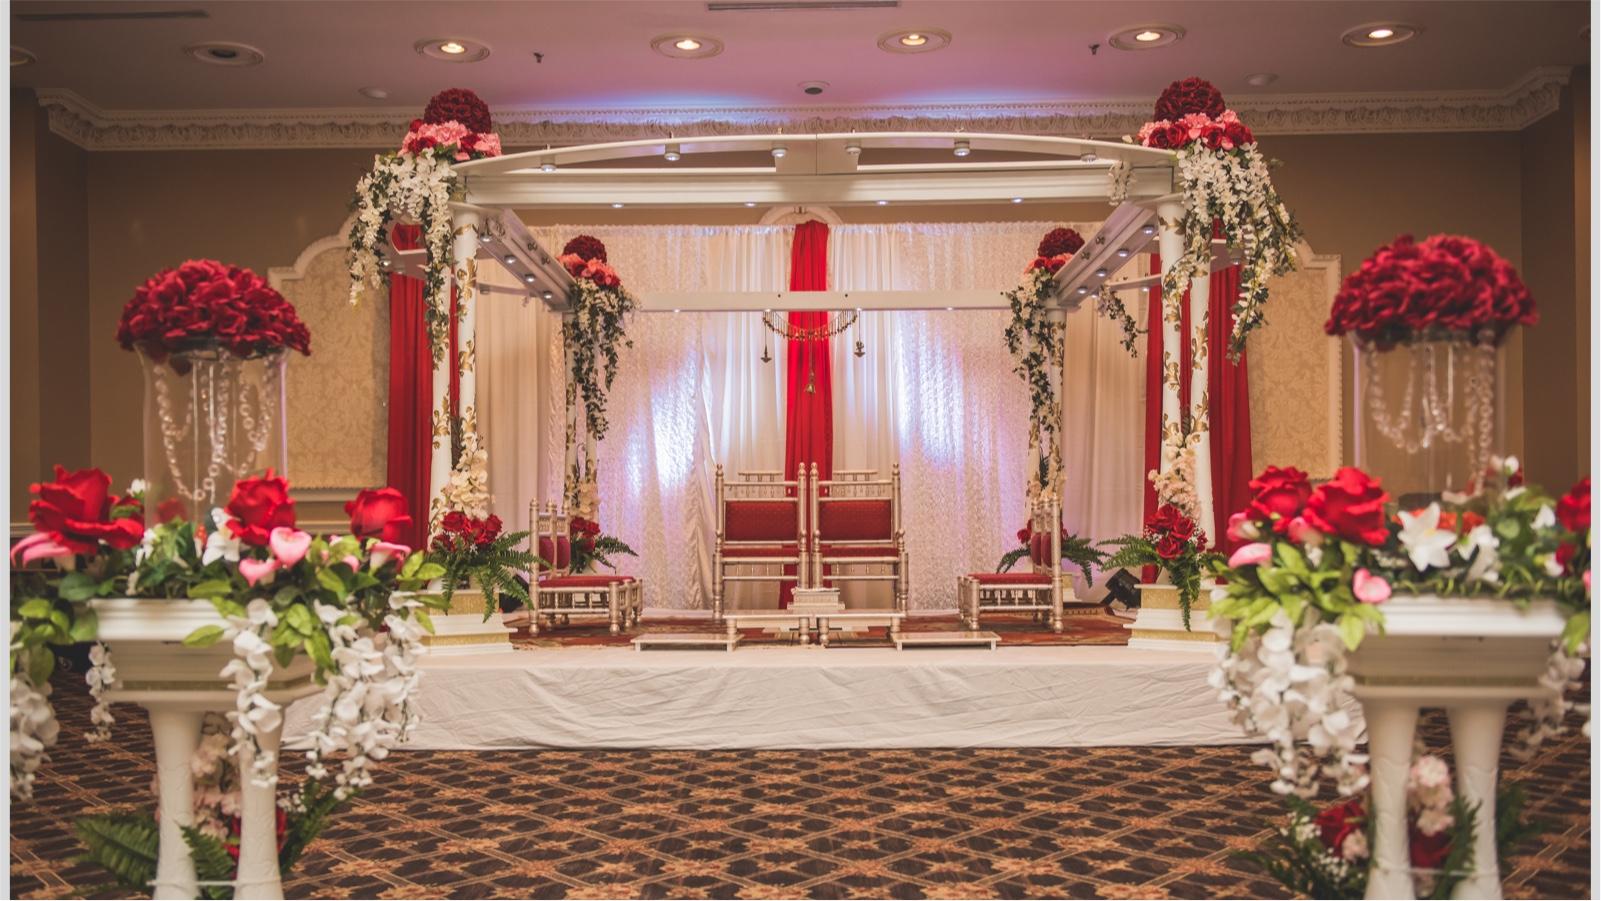 Ceremony Pa / Wedding DJ Service